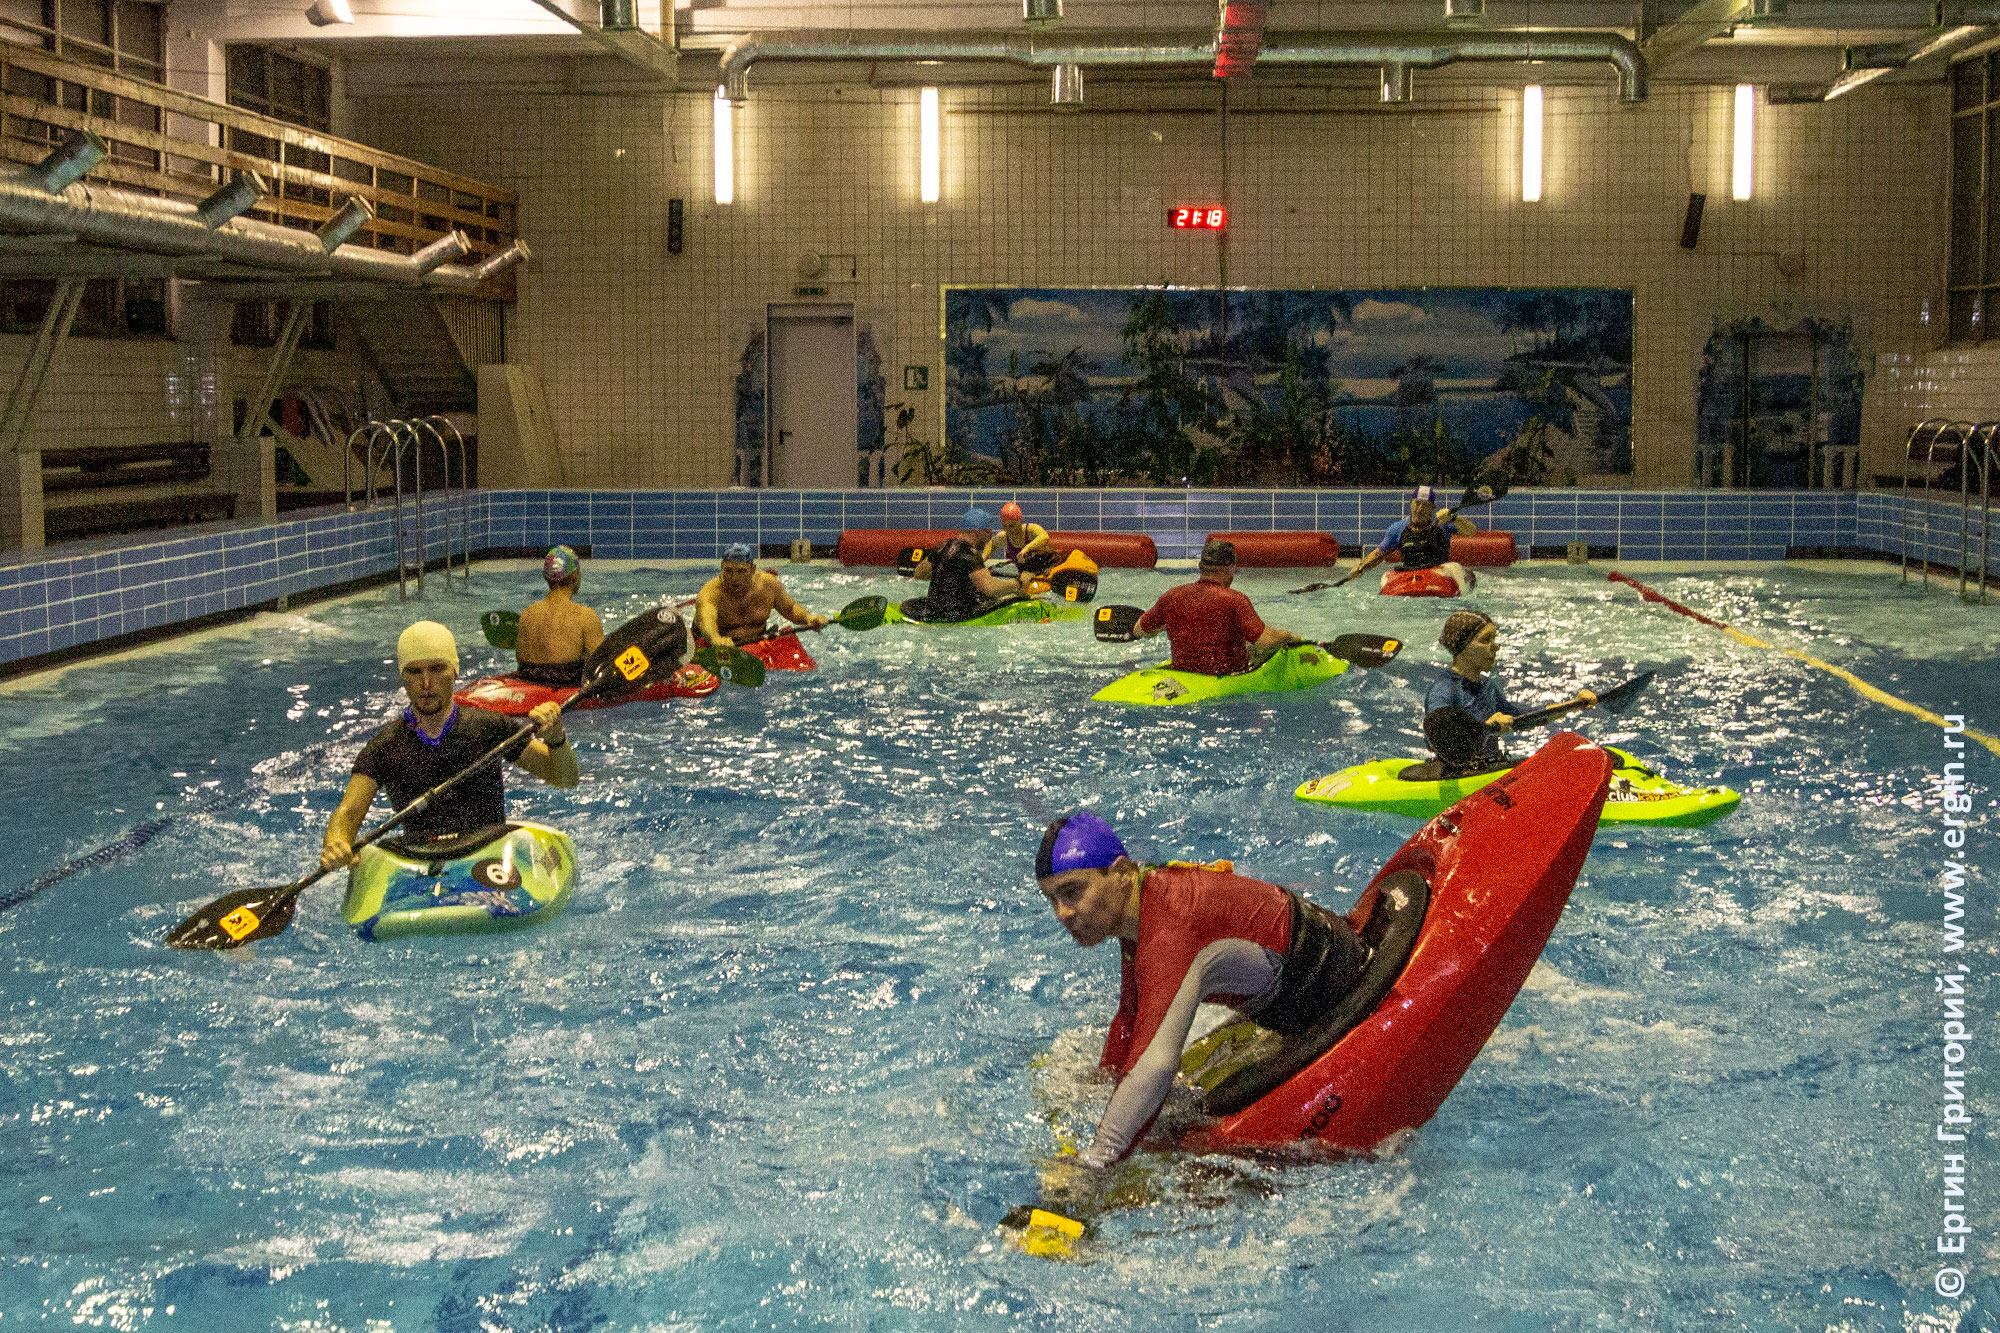 Школа каякинга в бассейне, Санкт-Петербург